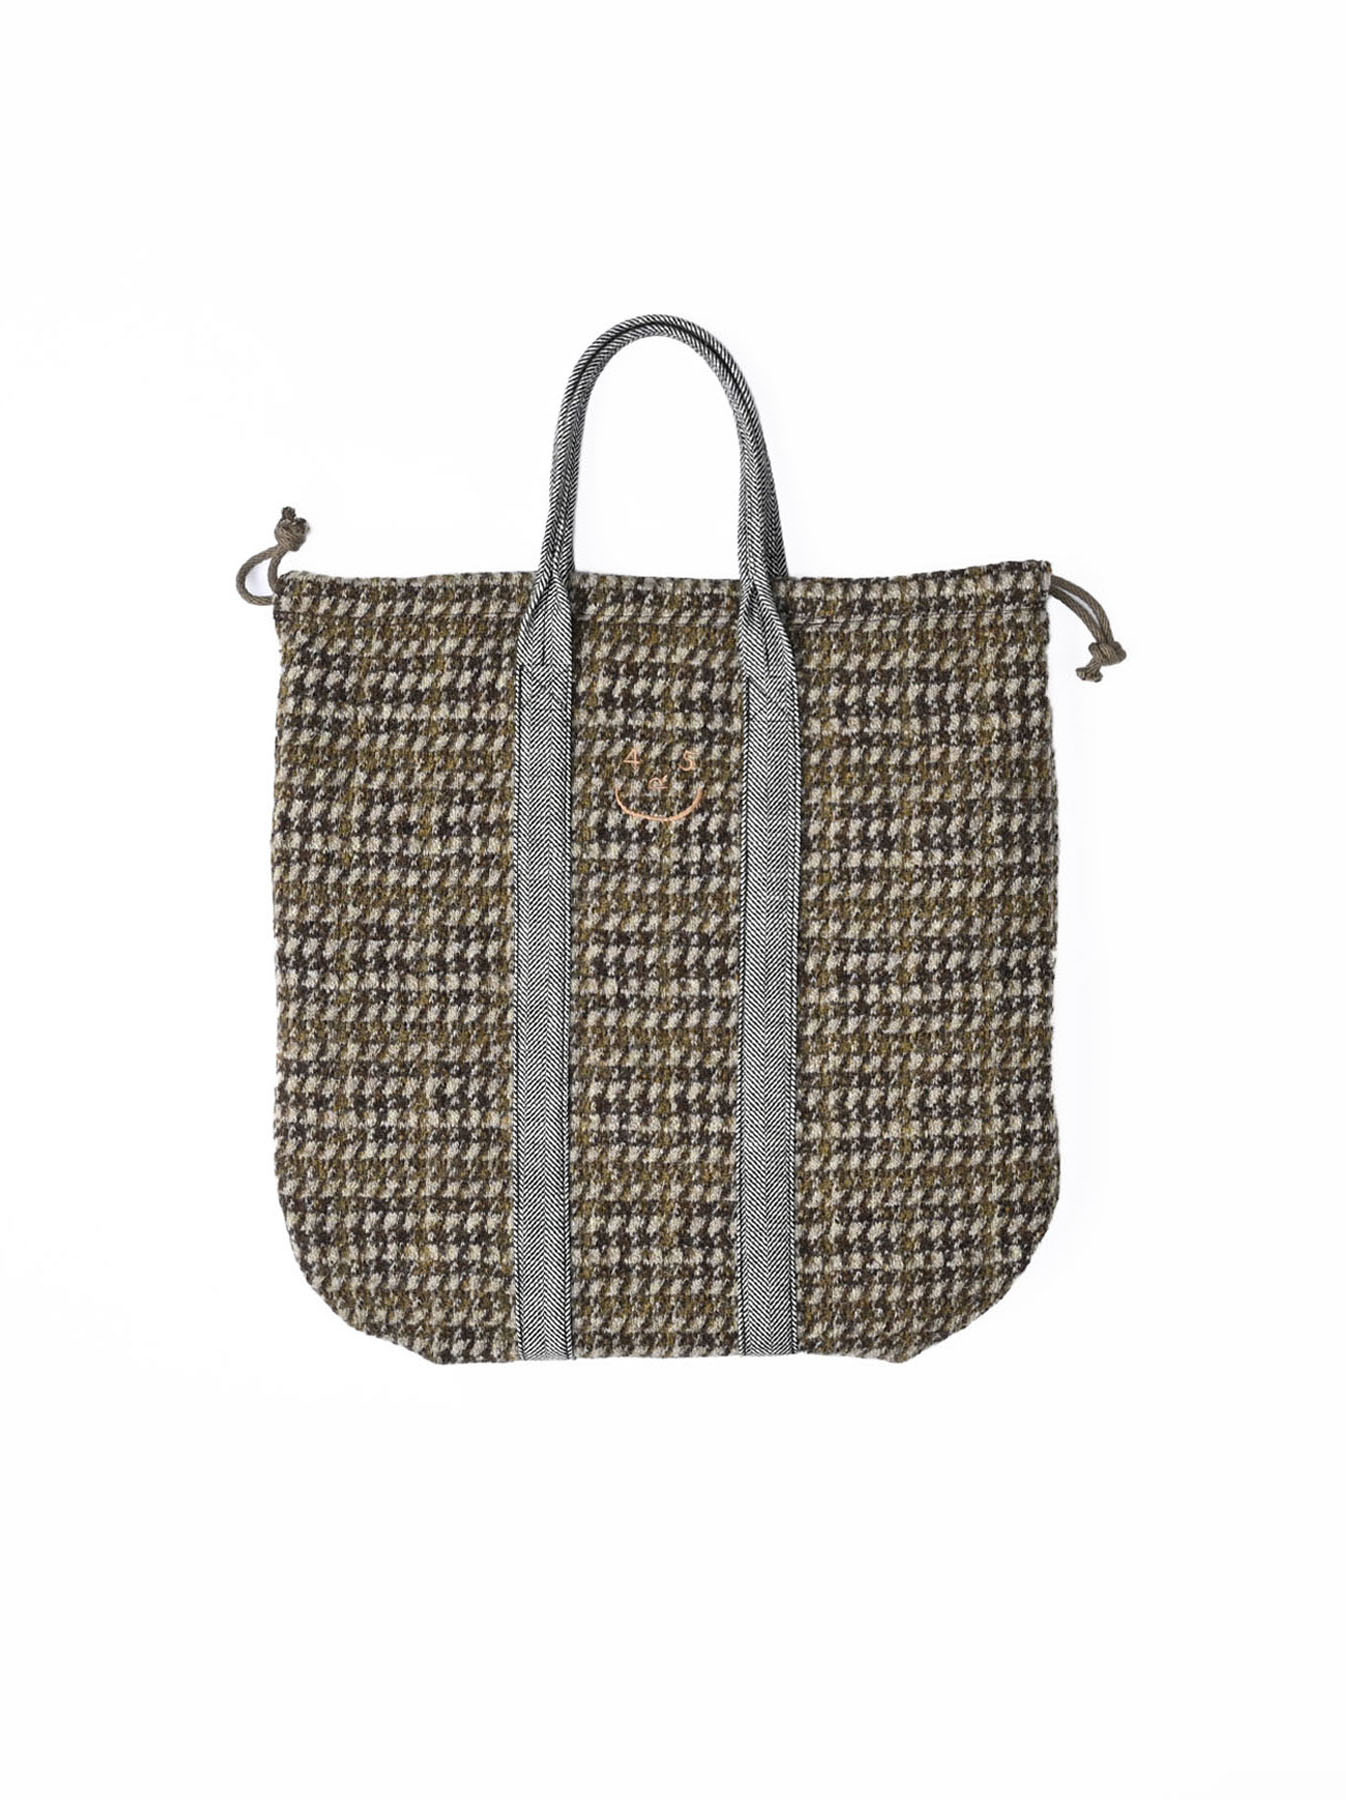 Tweed Knit and Nylon Tote Bag-1